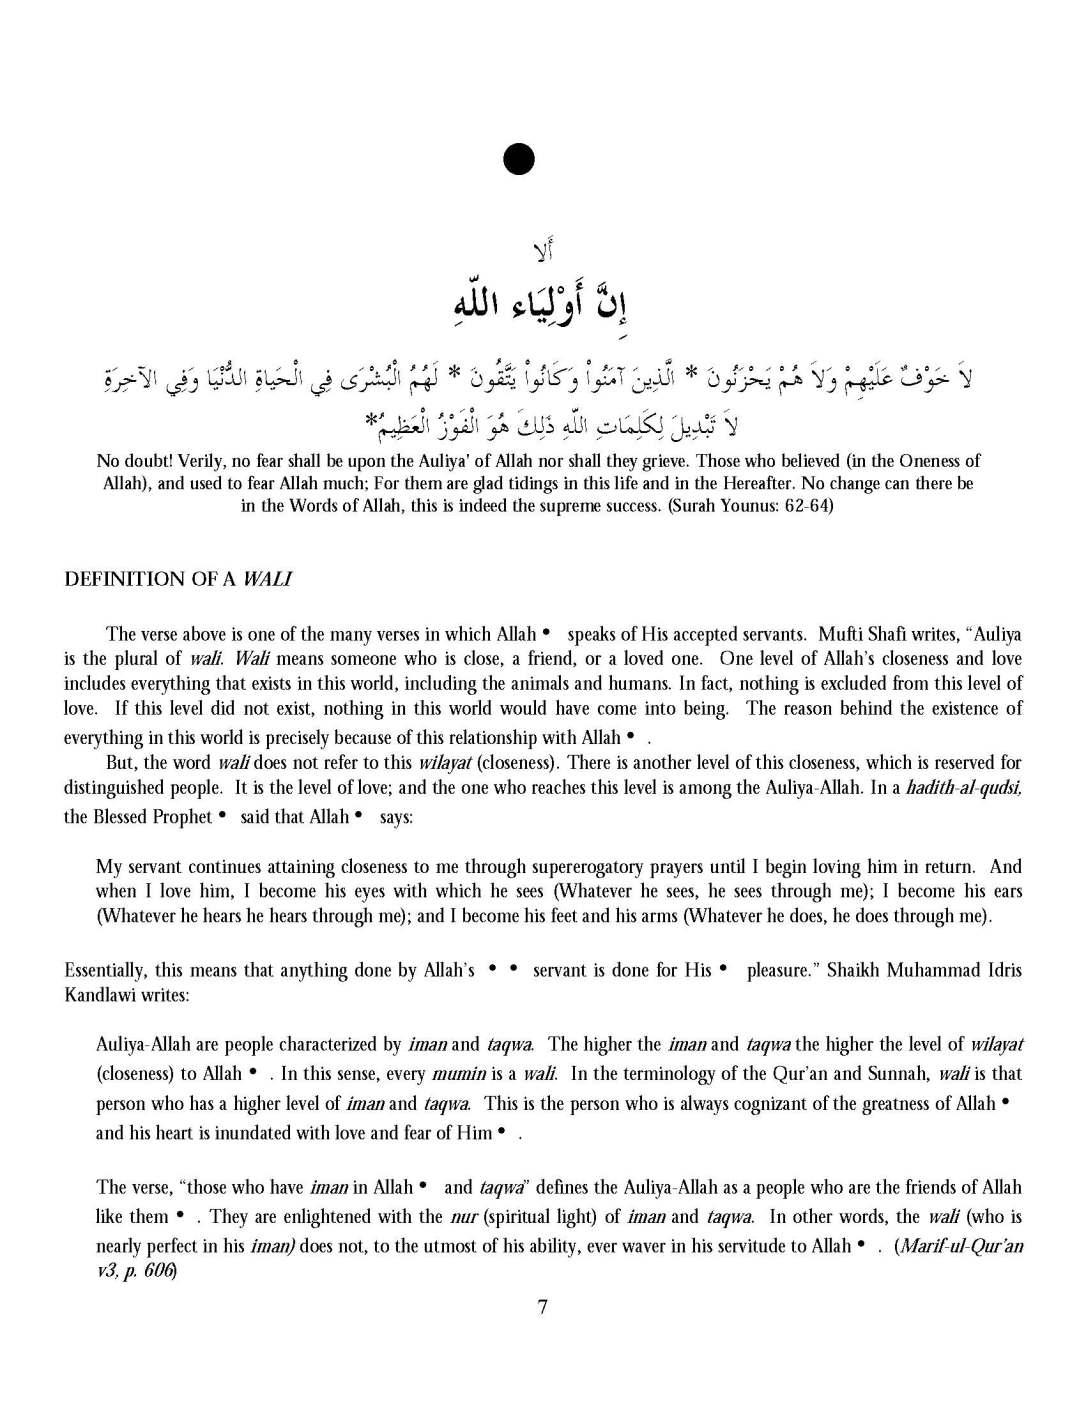 ConsequencesOfDebasingAuliyaAllah_Page_08